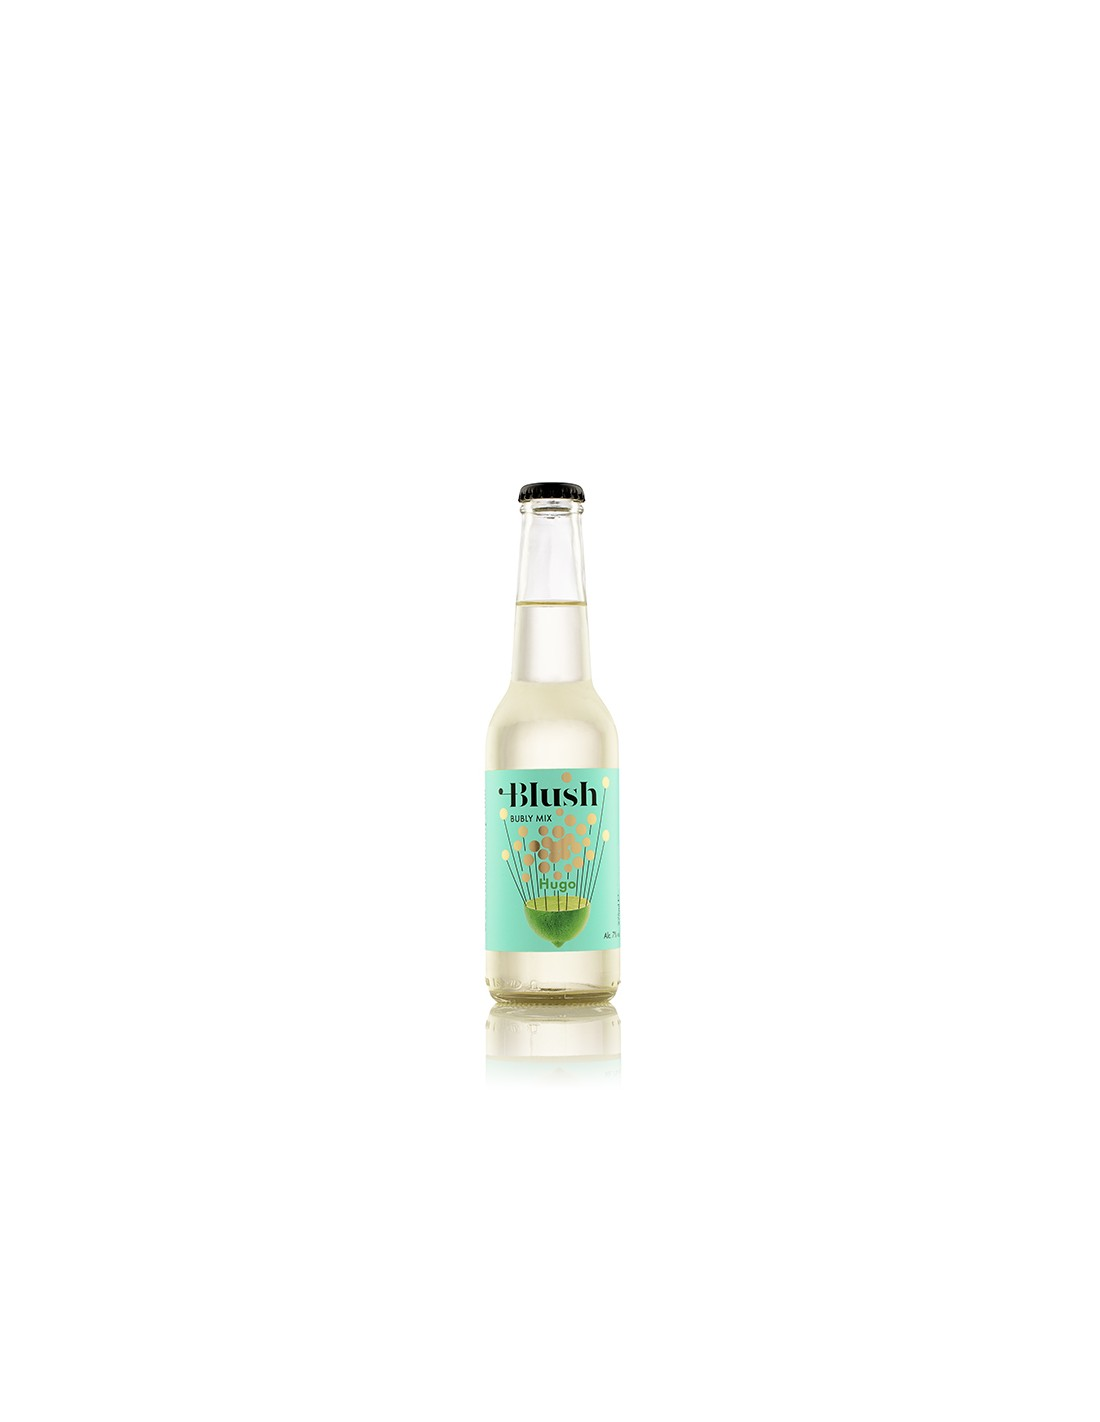 Cocktail alb demidulce, Blush Hugo, Ciumbrud, 7% alc., 0.275L, Romania